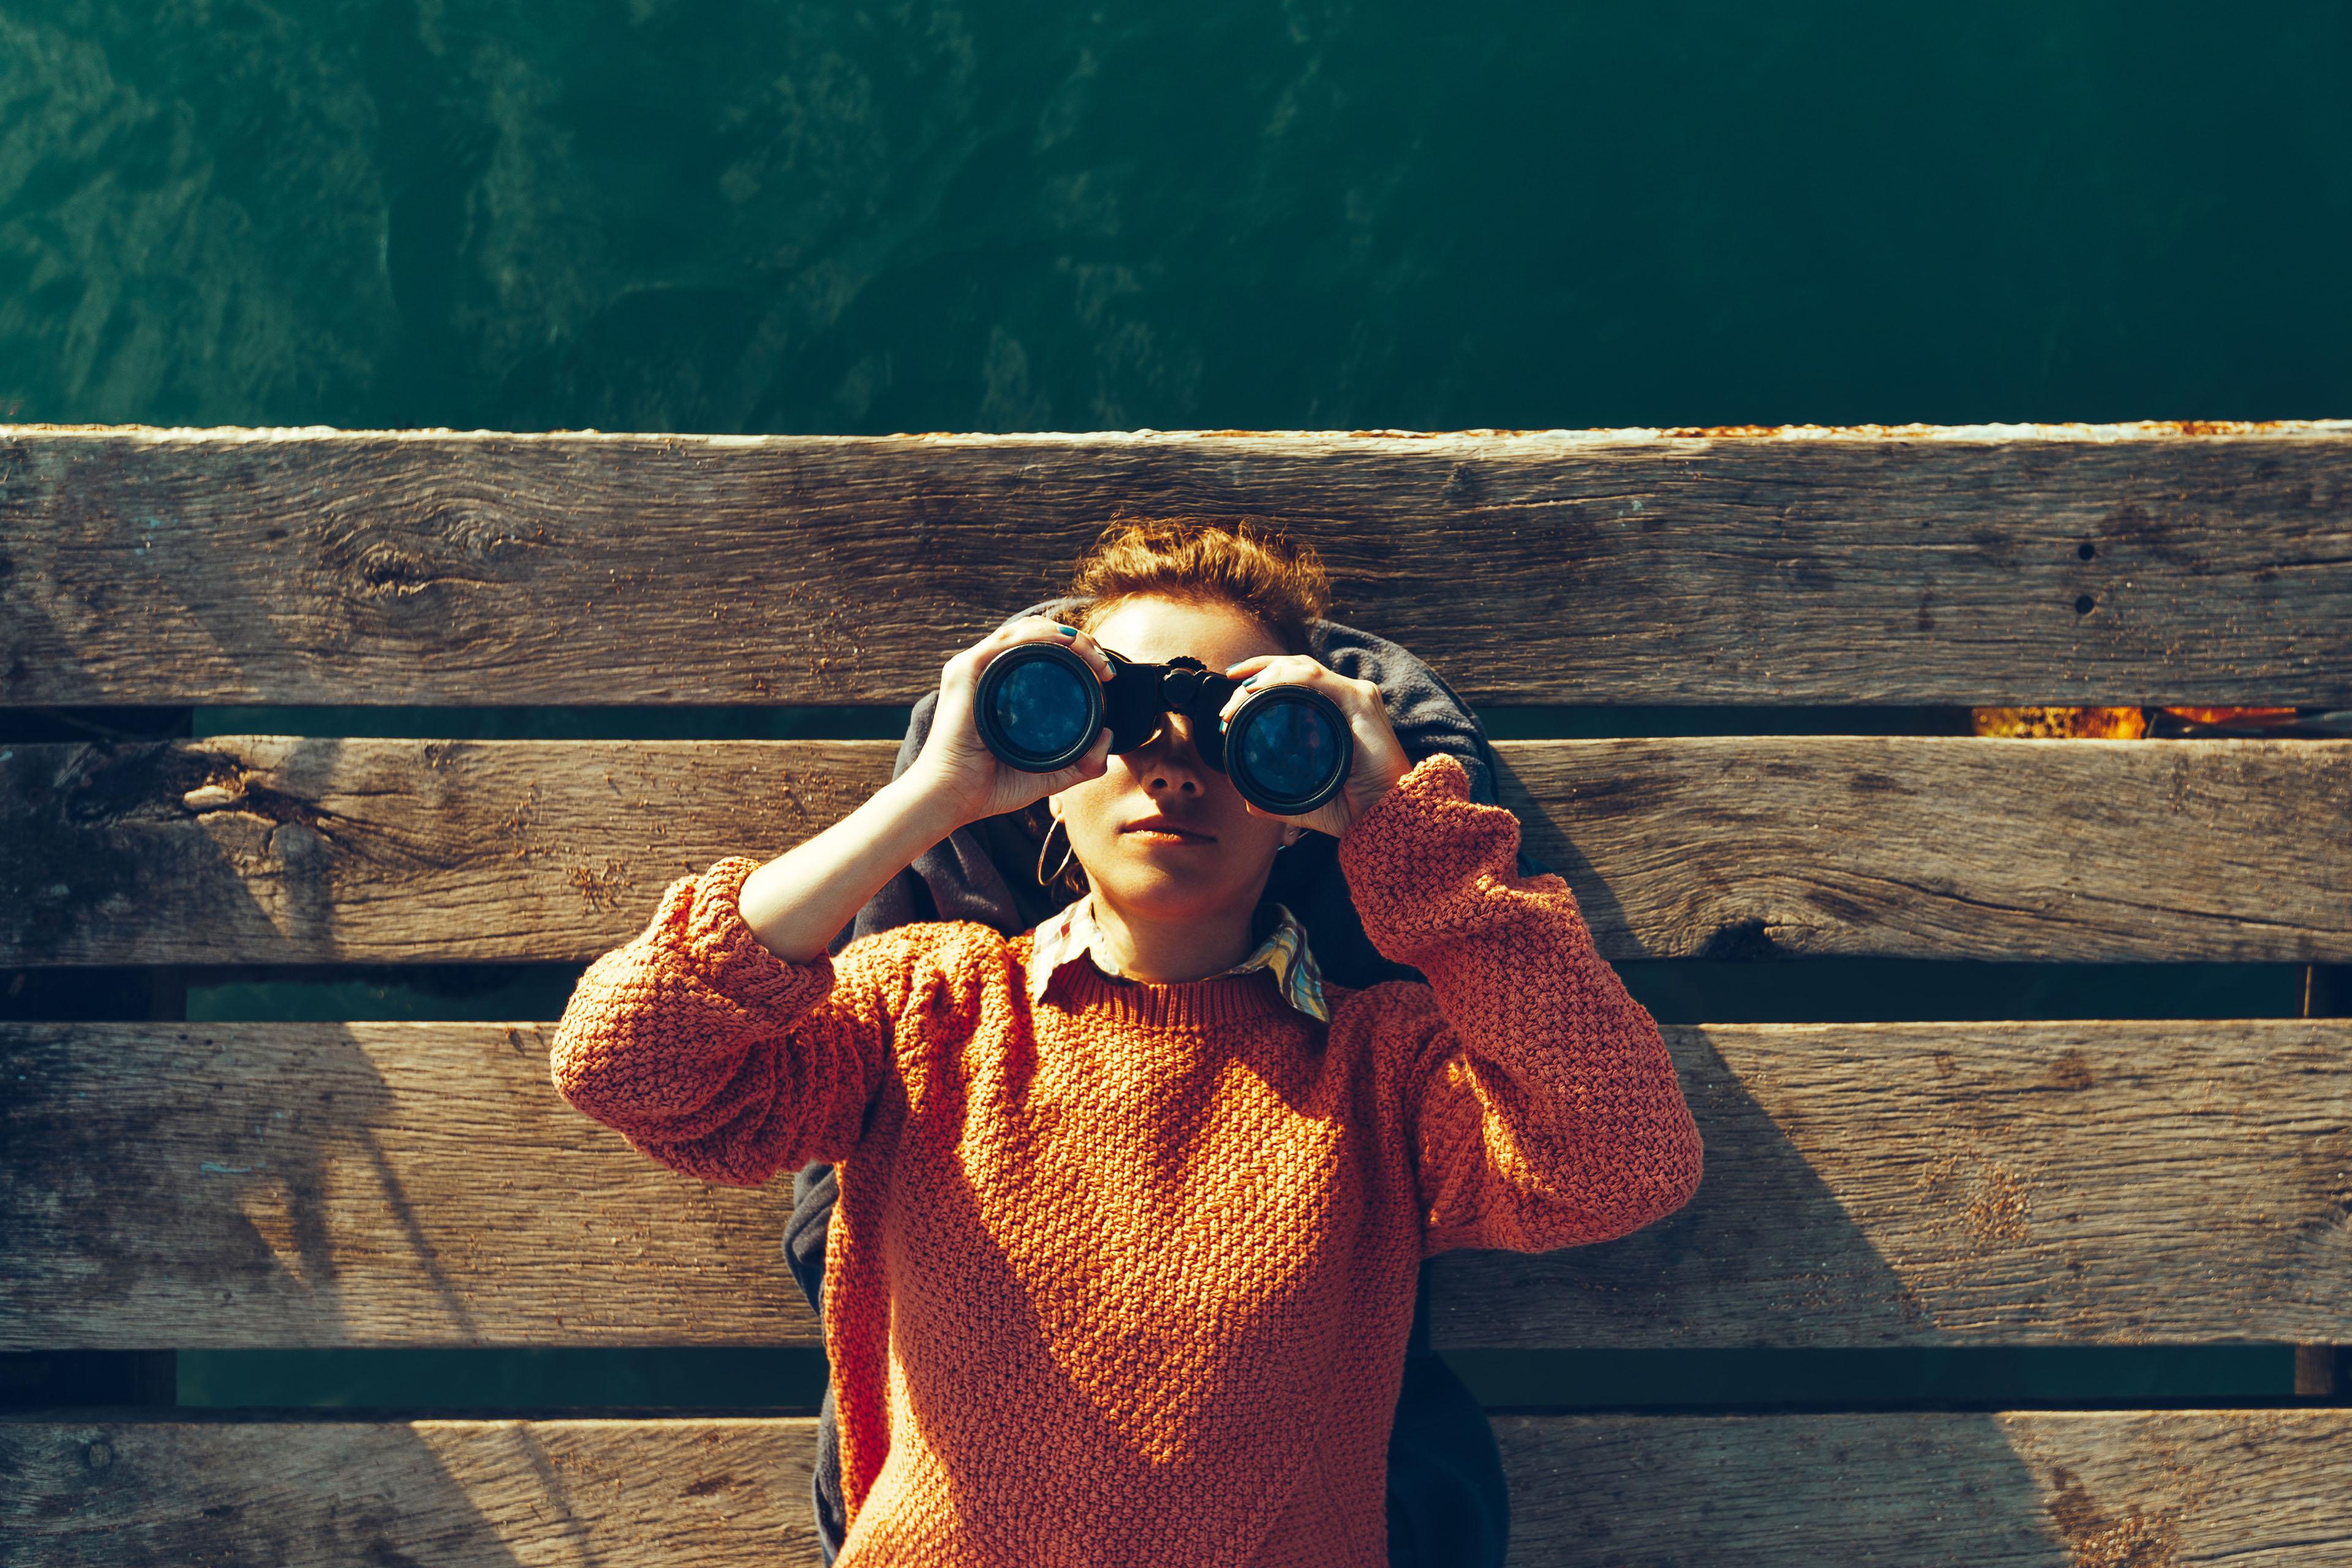 Young girl on pier looking through binoculars